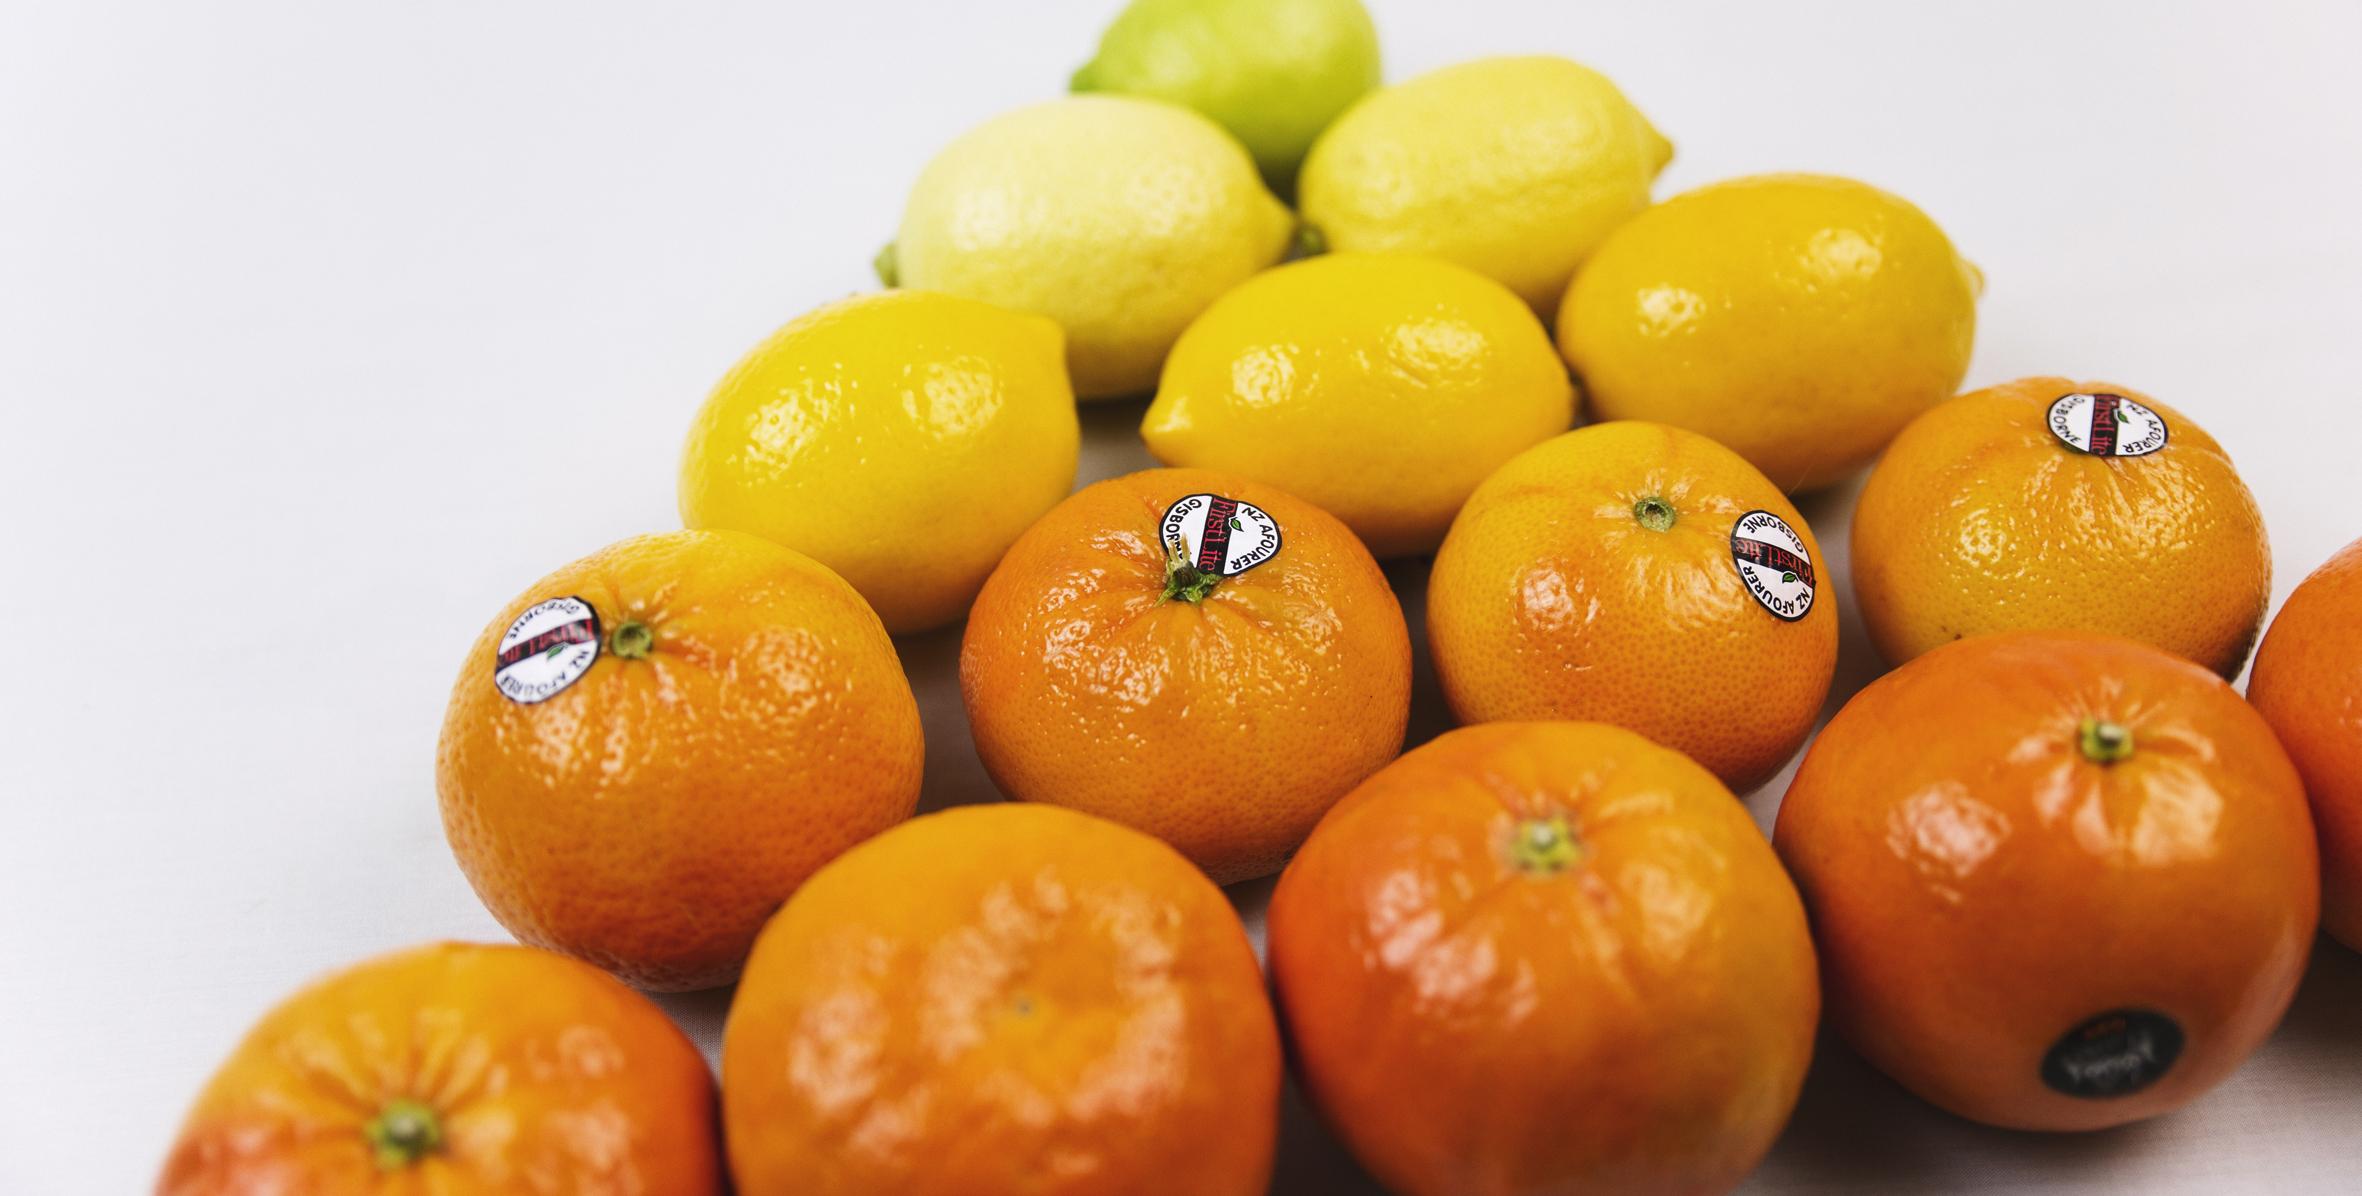 Zeafruit Citrus limes, lemons, mandarins, oranges, tangelos, and grapefruit